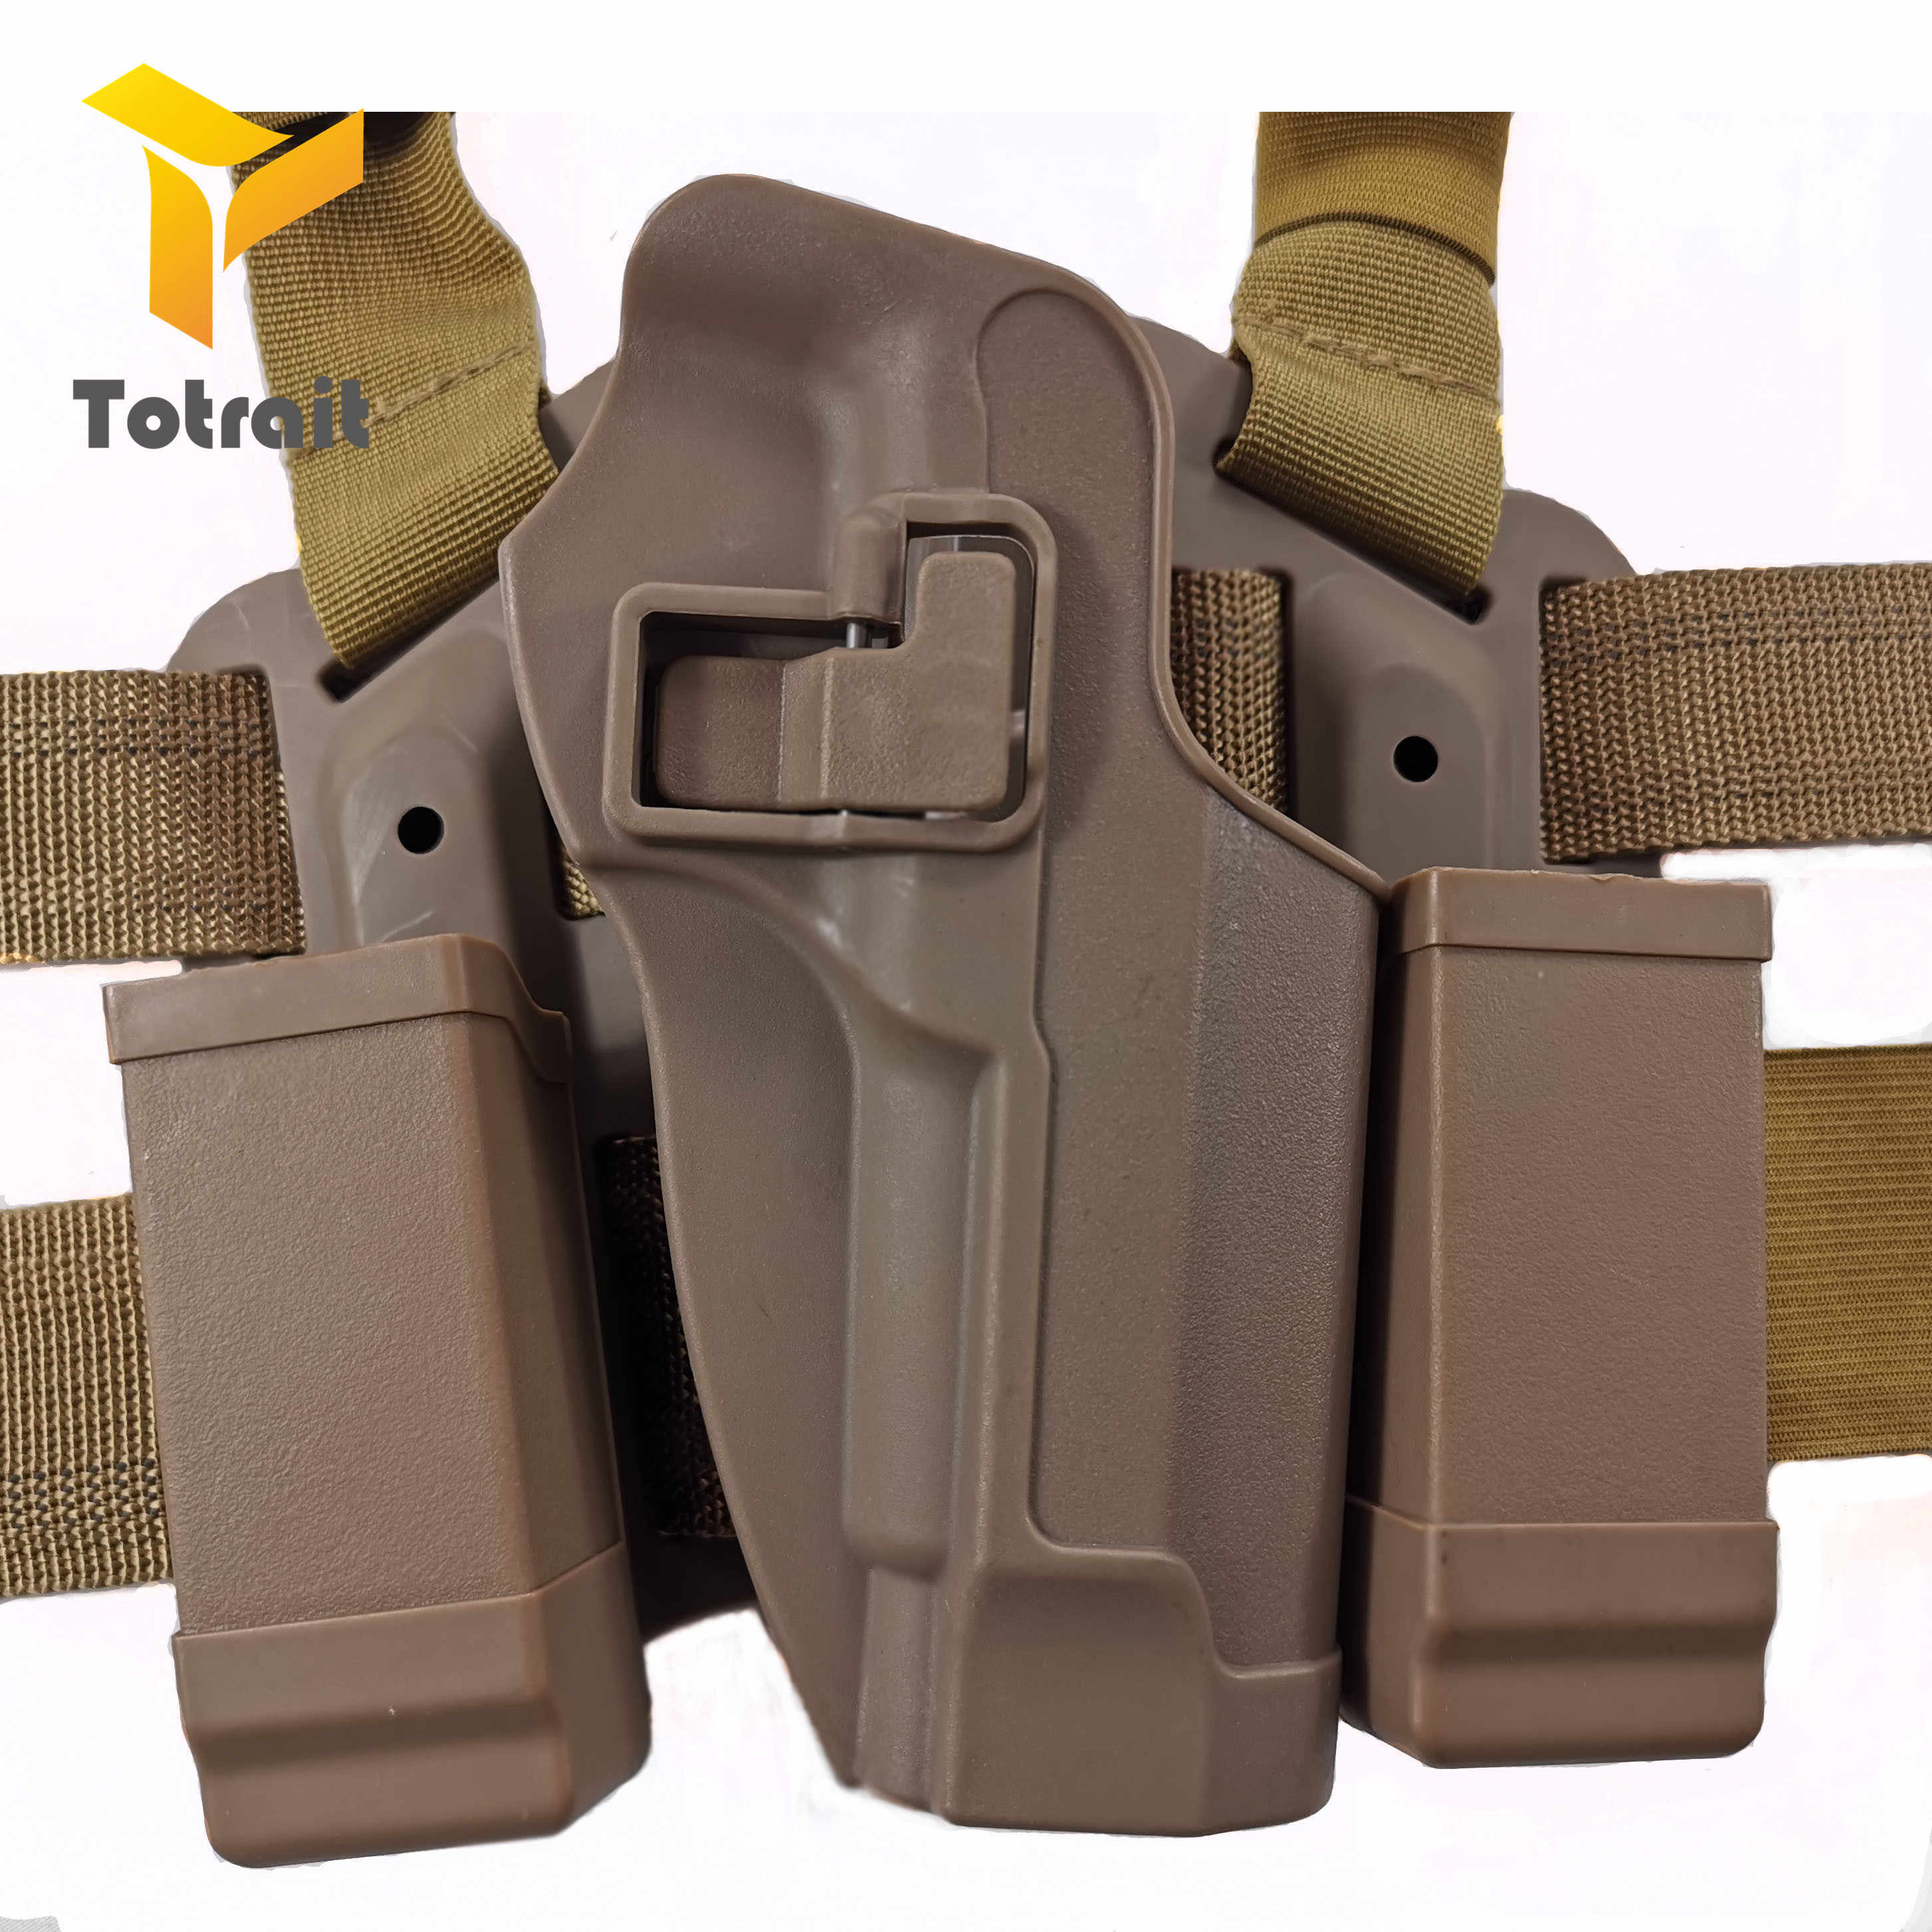 TOtrait Tactical udo noga kabura z podwójnym magazynem CQC M9 nóżka stojak kabura pistolet pistolet kabura dla M9 92 96 czarny